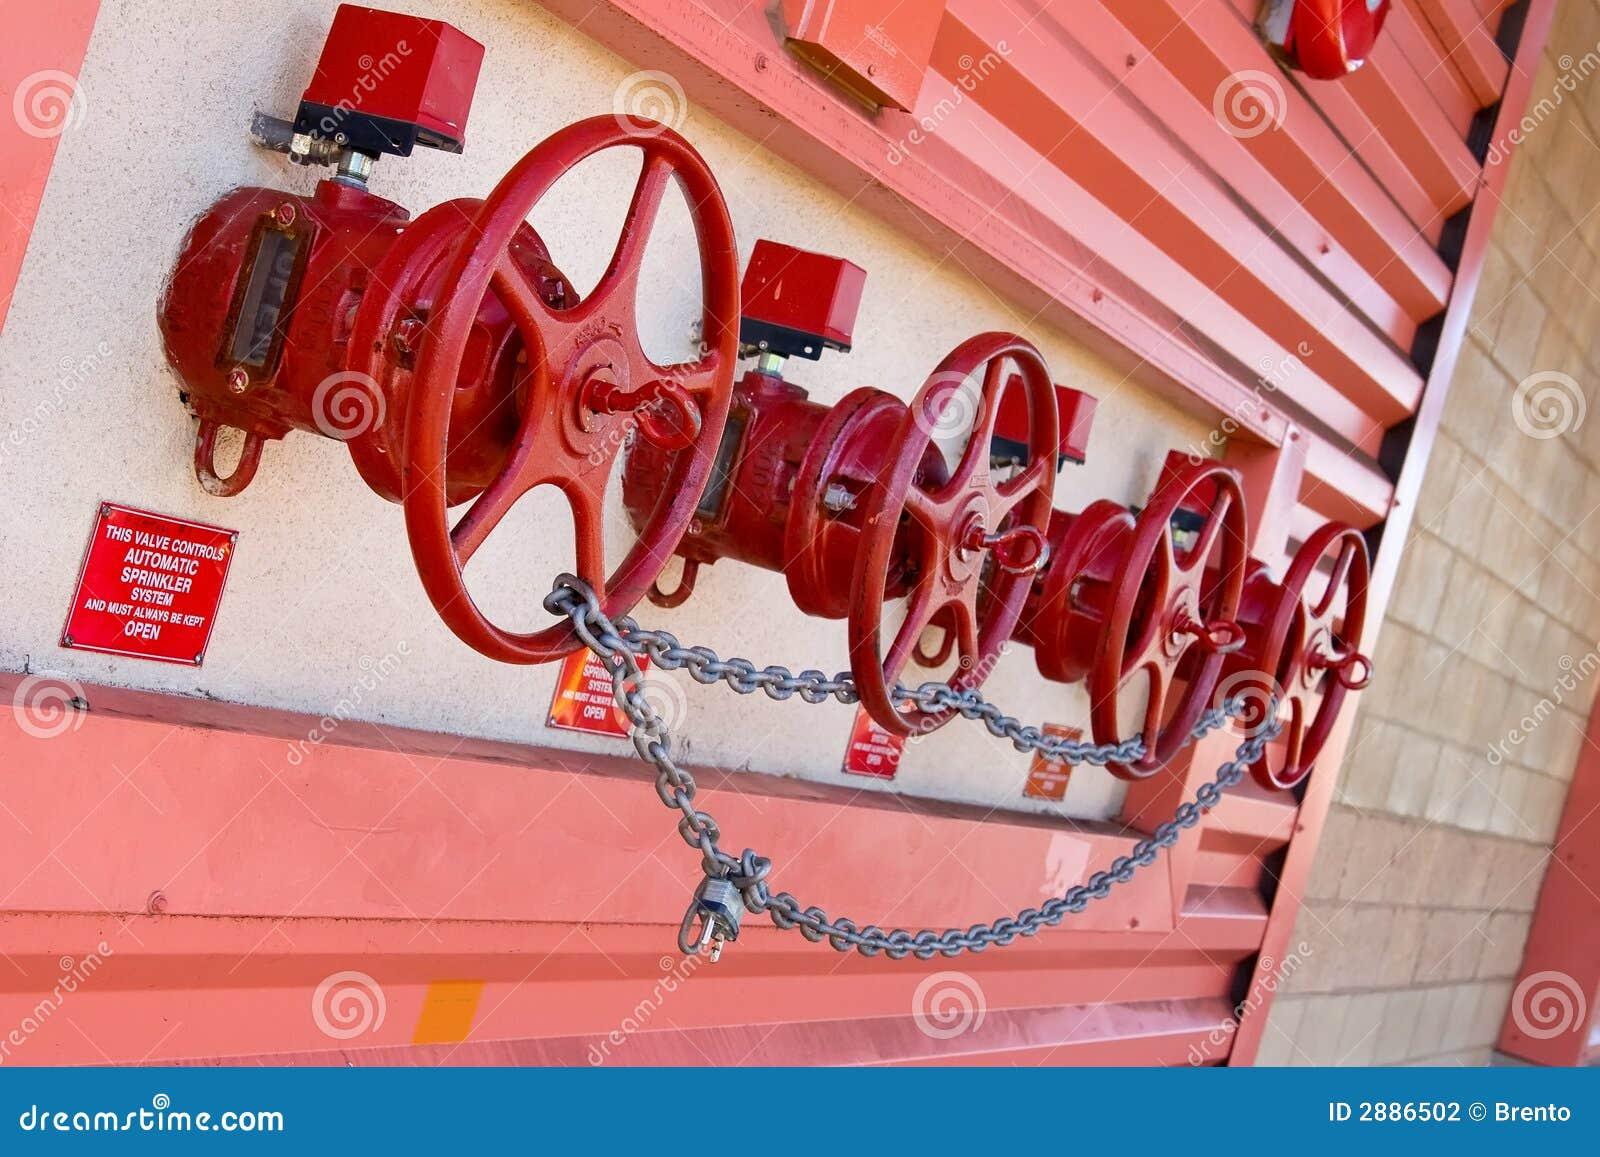 Stock Photography Sprinkler Valves Image2886502